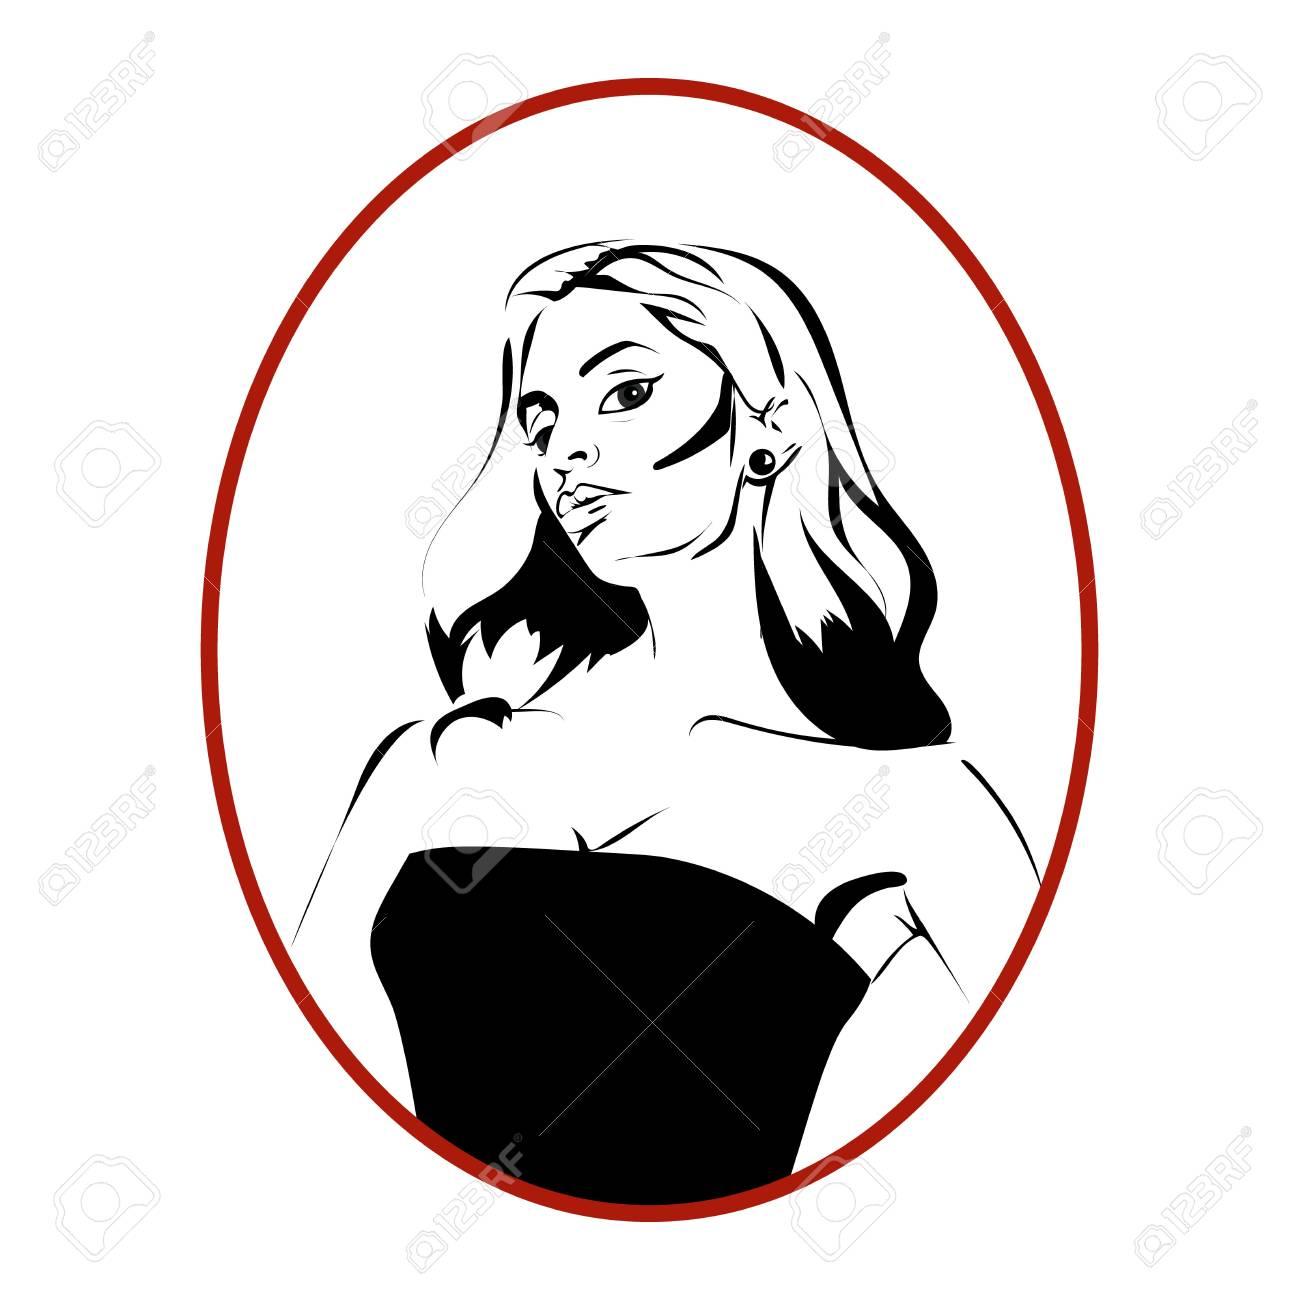 Woman Diva Monochrome Cartoon Icon Or Avatar Royalty Free Cliparts